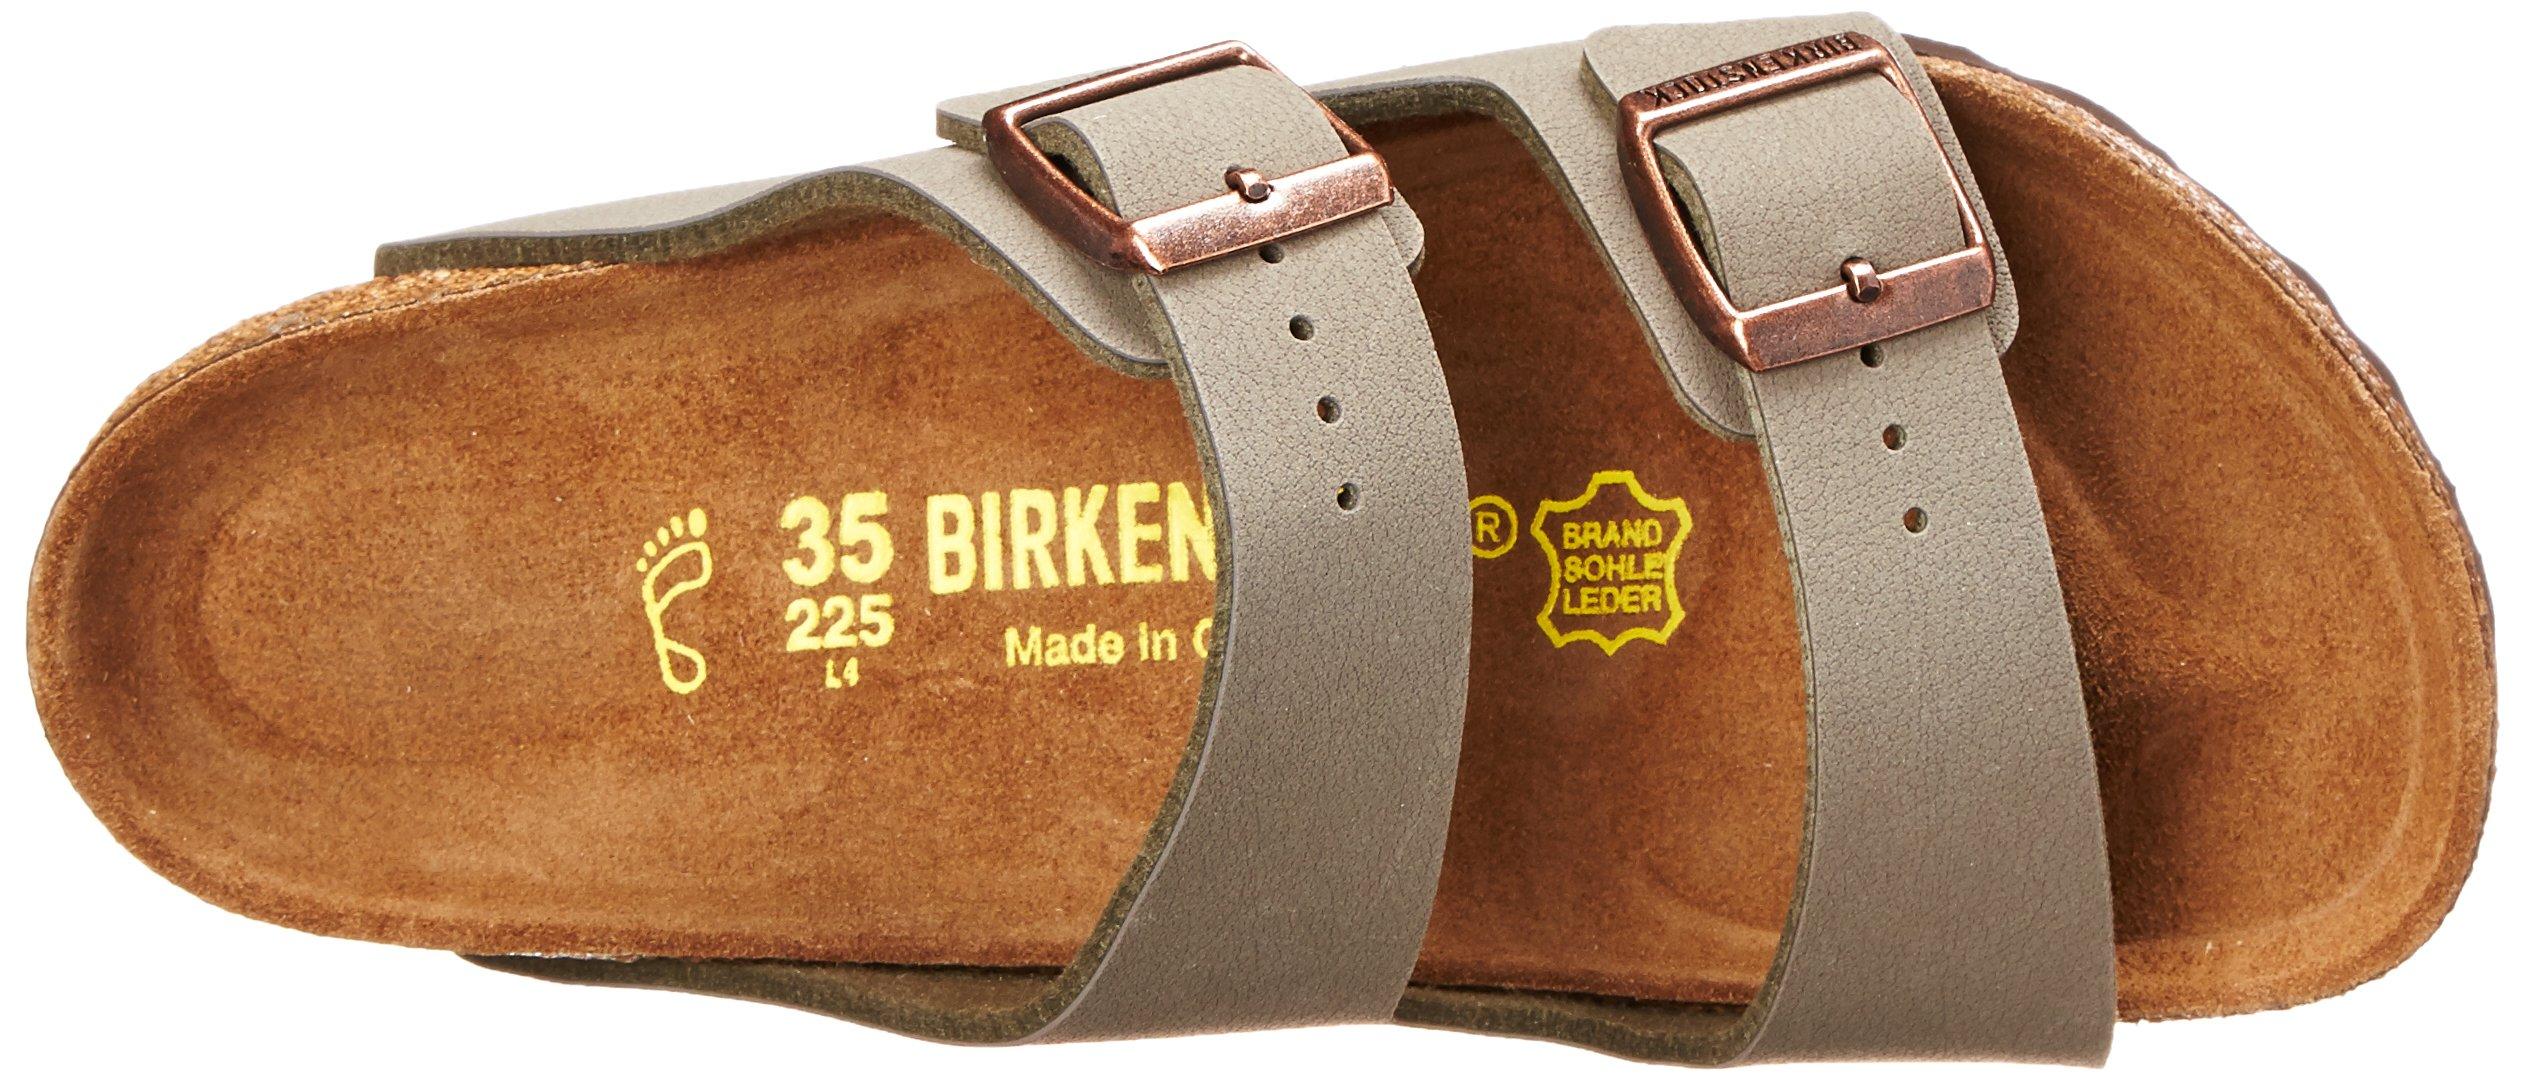 Birkenstock Arizona-Birkibuc(tm) (Unisex), Stone Birkibuc&Trade, 35 (US Women's 4-4.5) Regular by Birkenstock (Image #8)